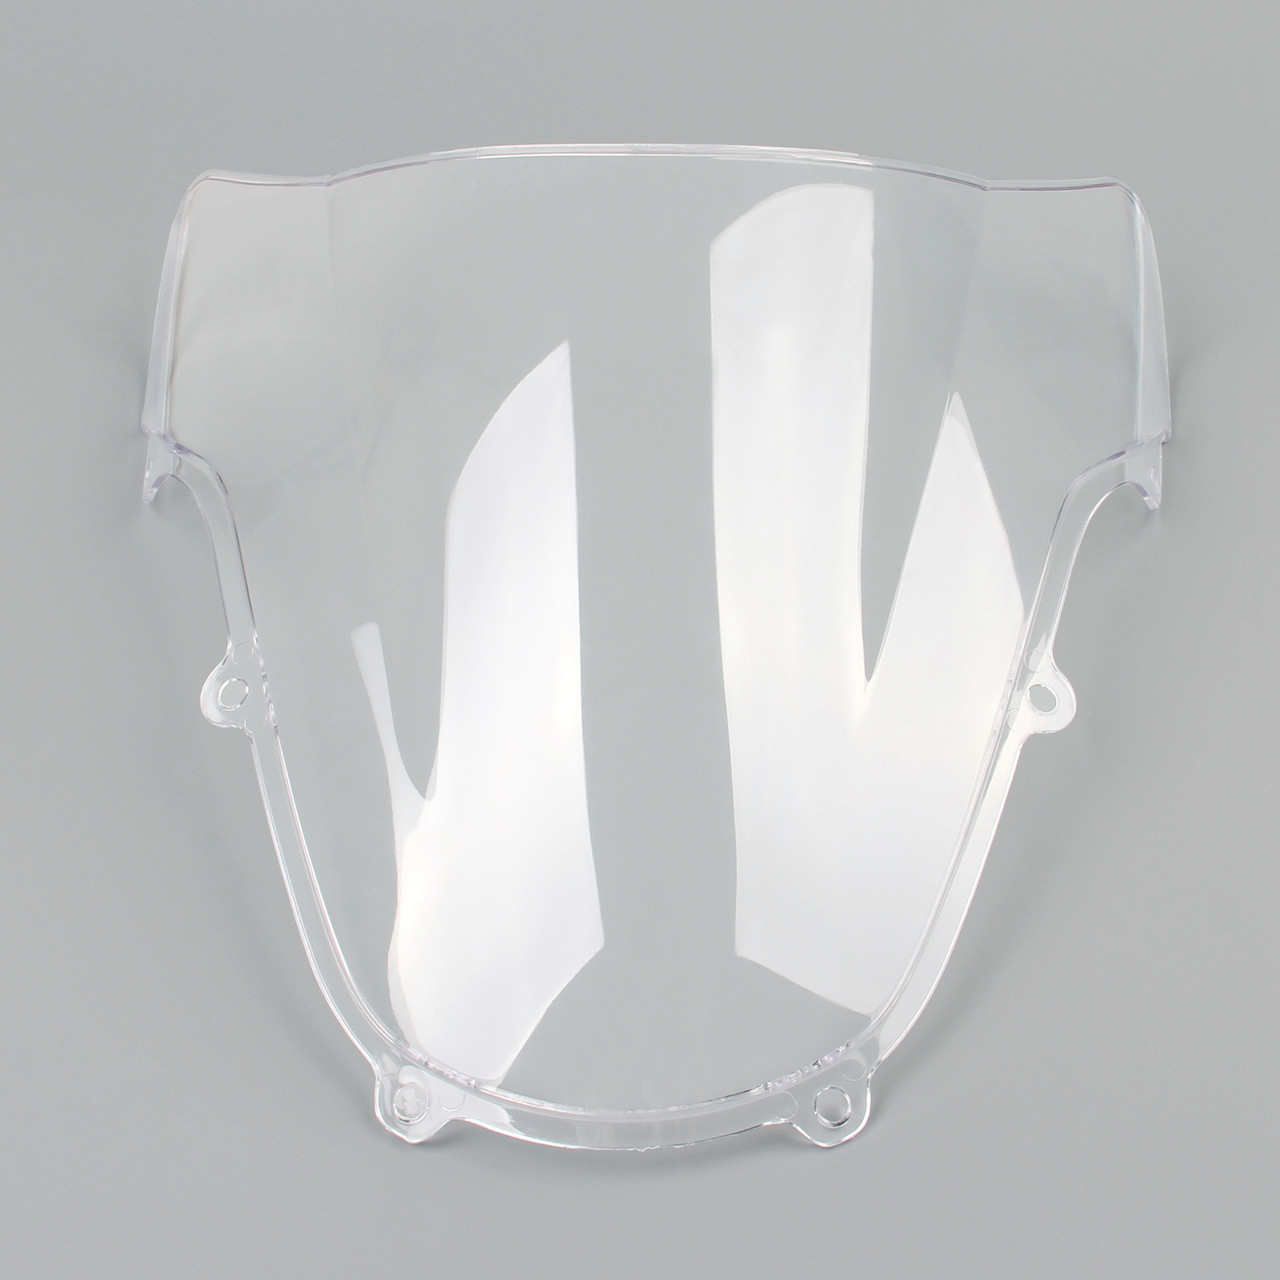 http://www.madhornets.store/AMZ/MotoPart/Windshield/Suzuki/WIN-S302/WIN-S302-Clear-1.jpg